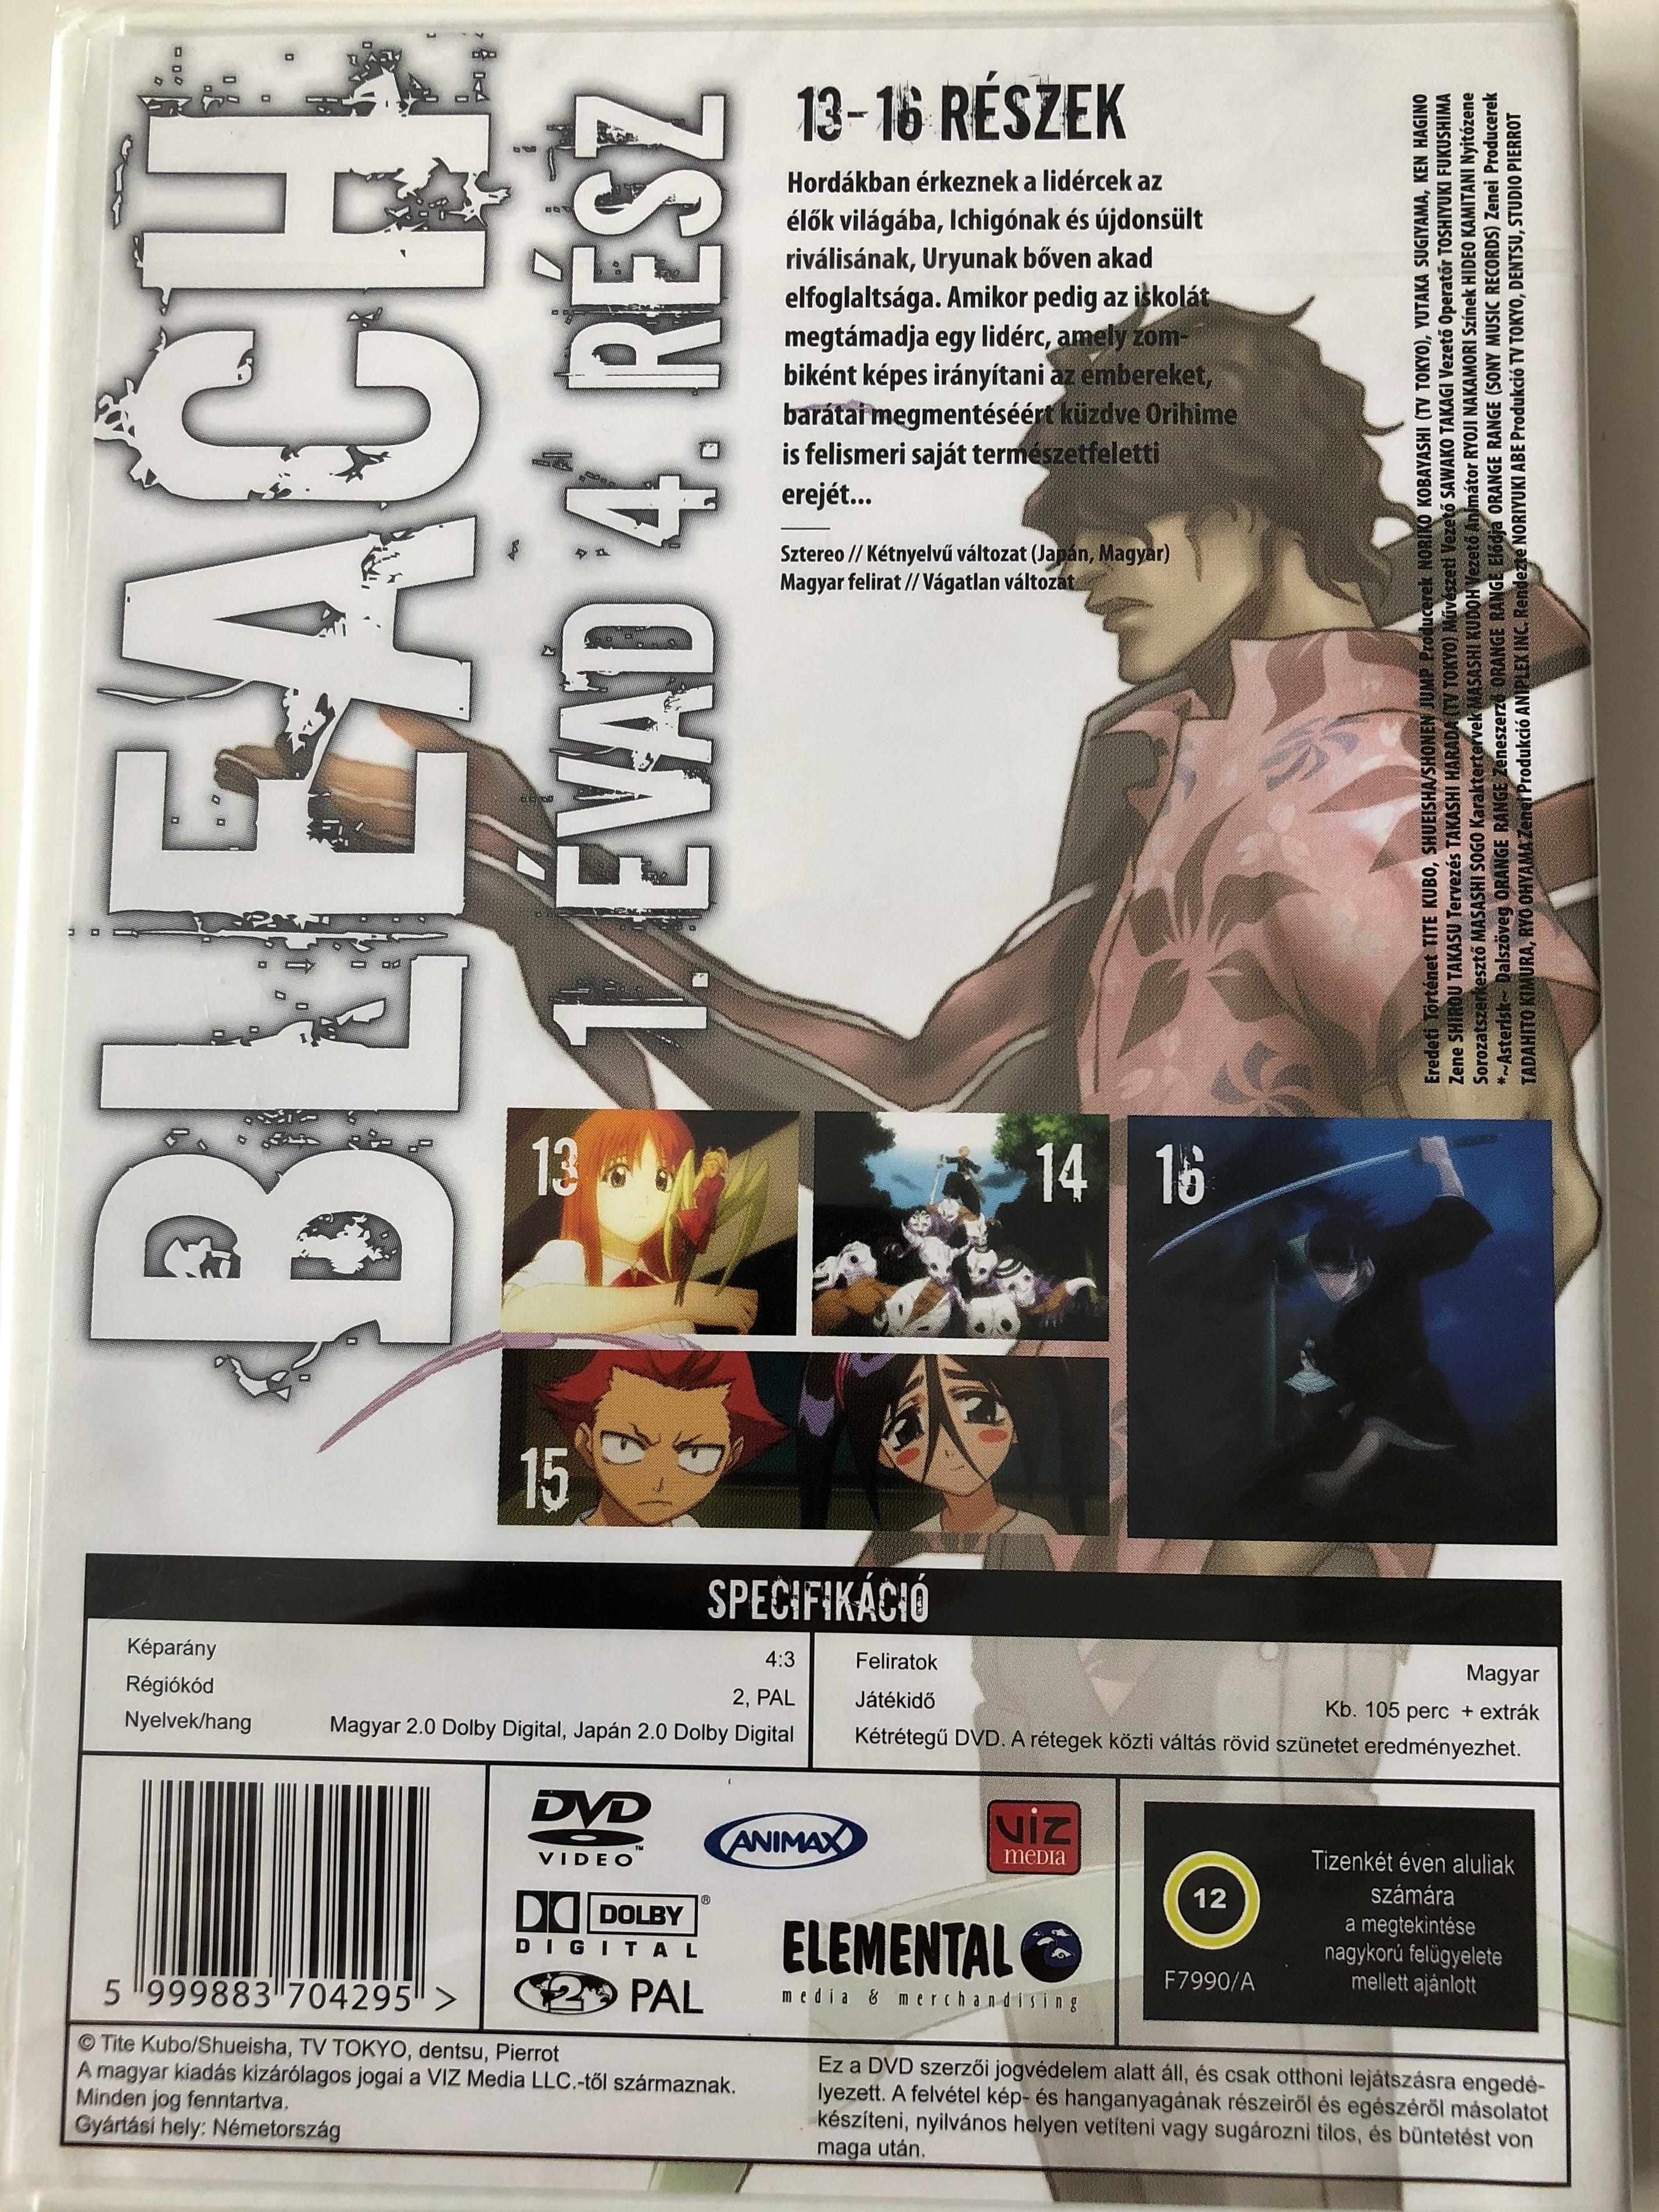 bleech-season-1-04-dvd-1.-vad-4.-r-sz-episodes-13-16-directed-by-noriyuki-abe-2-.jpg